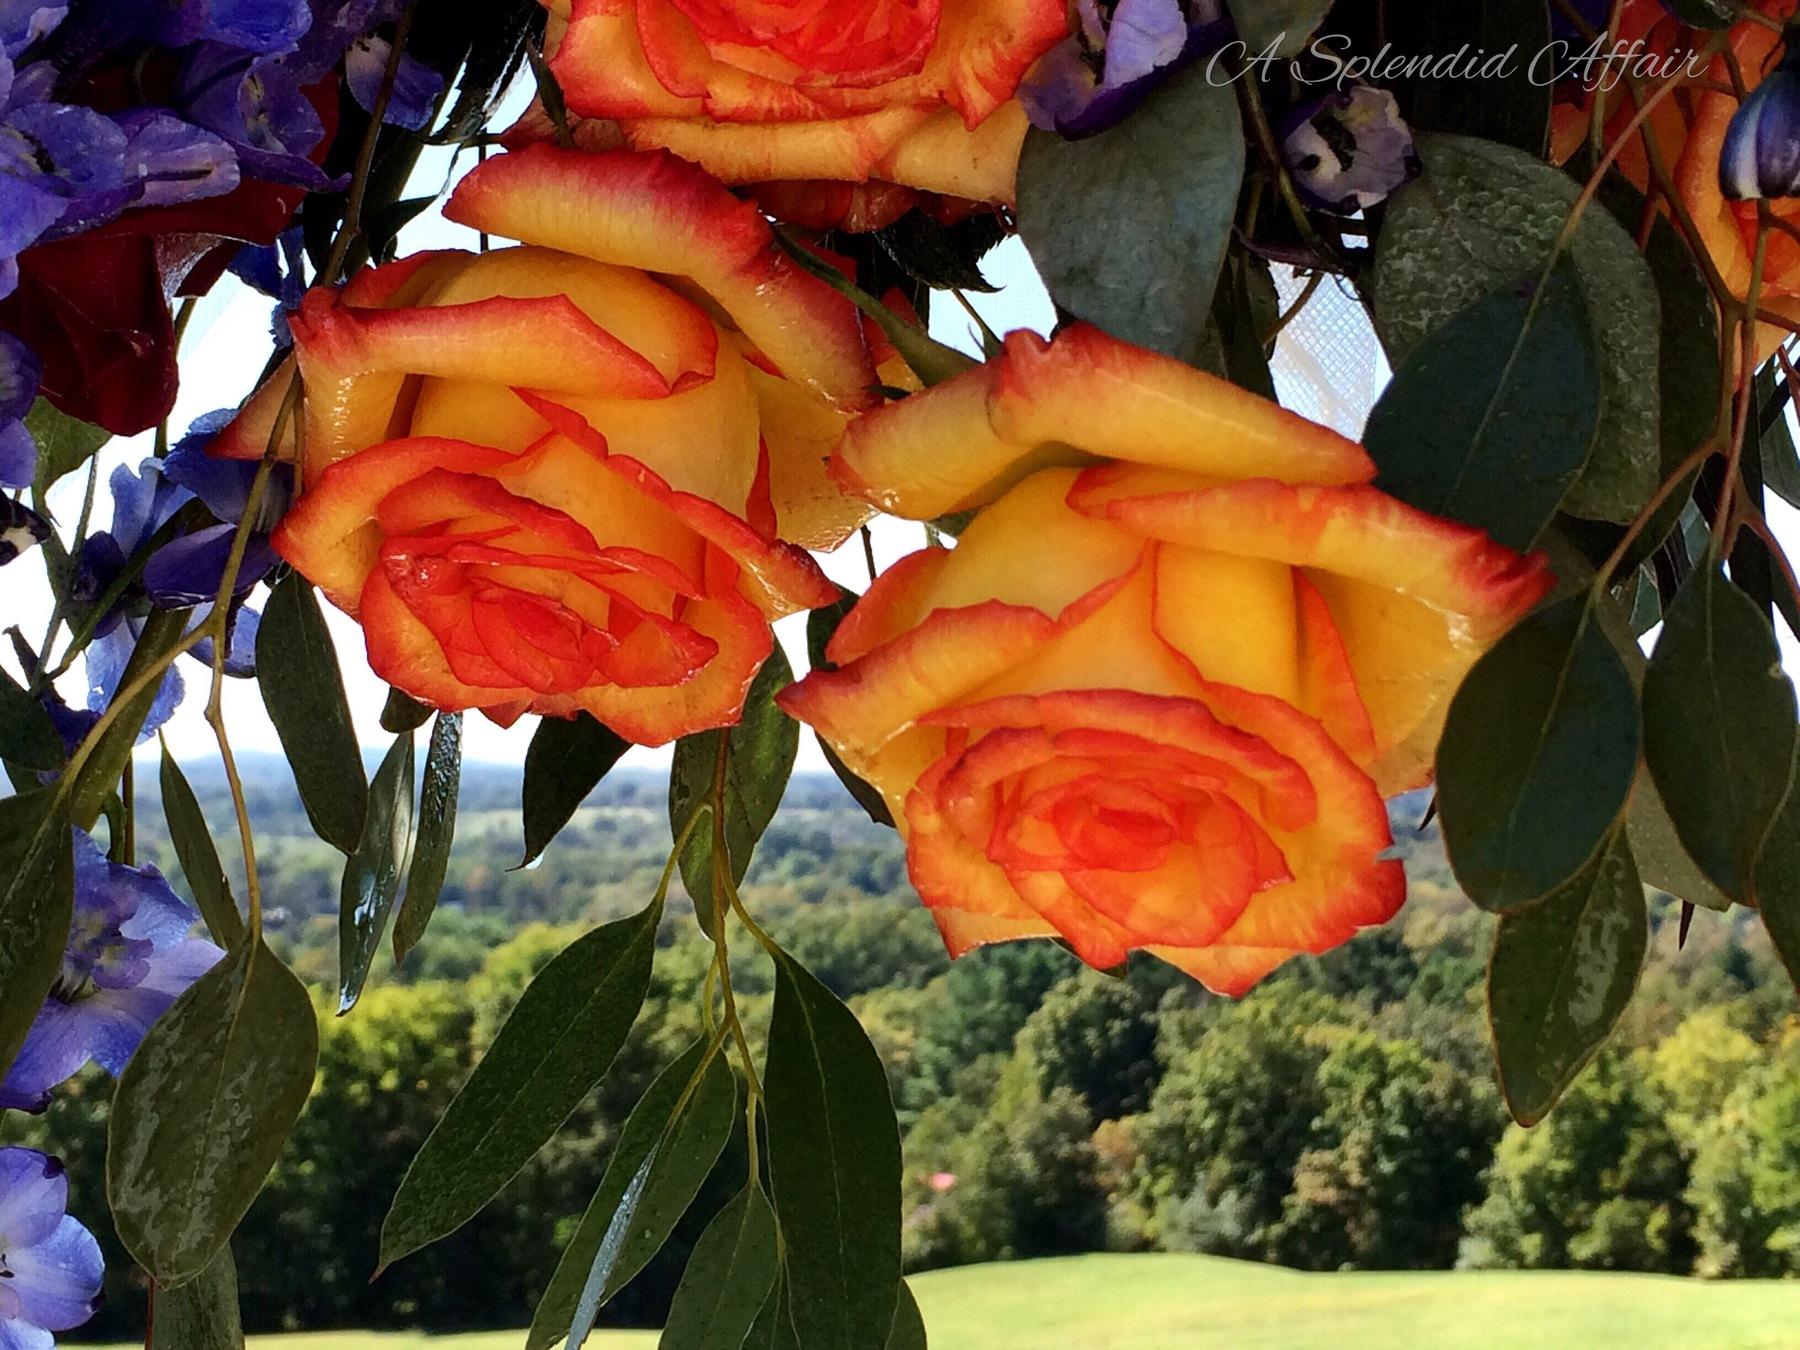 autumn_wedding__a_splendid_affair_carterville_il.jpg